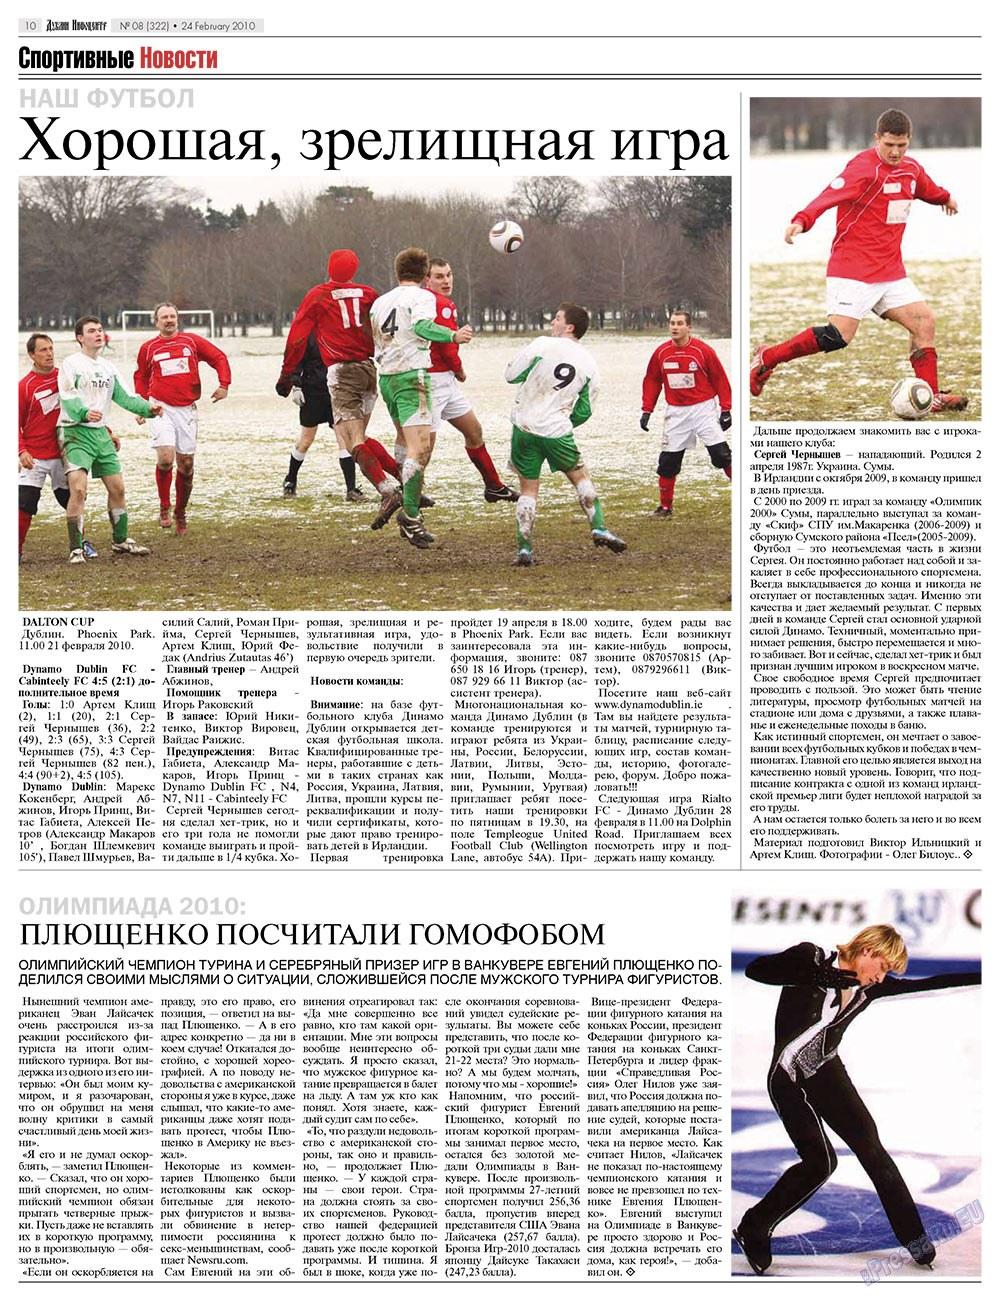 Дублин инфоцентр (газета). 2010 год, номер 8, стр. 10